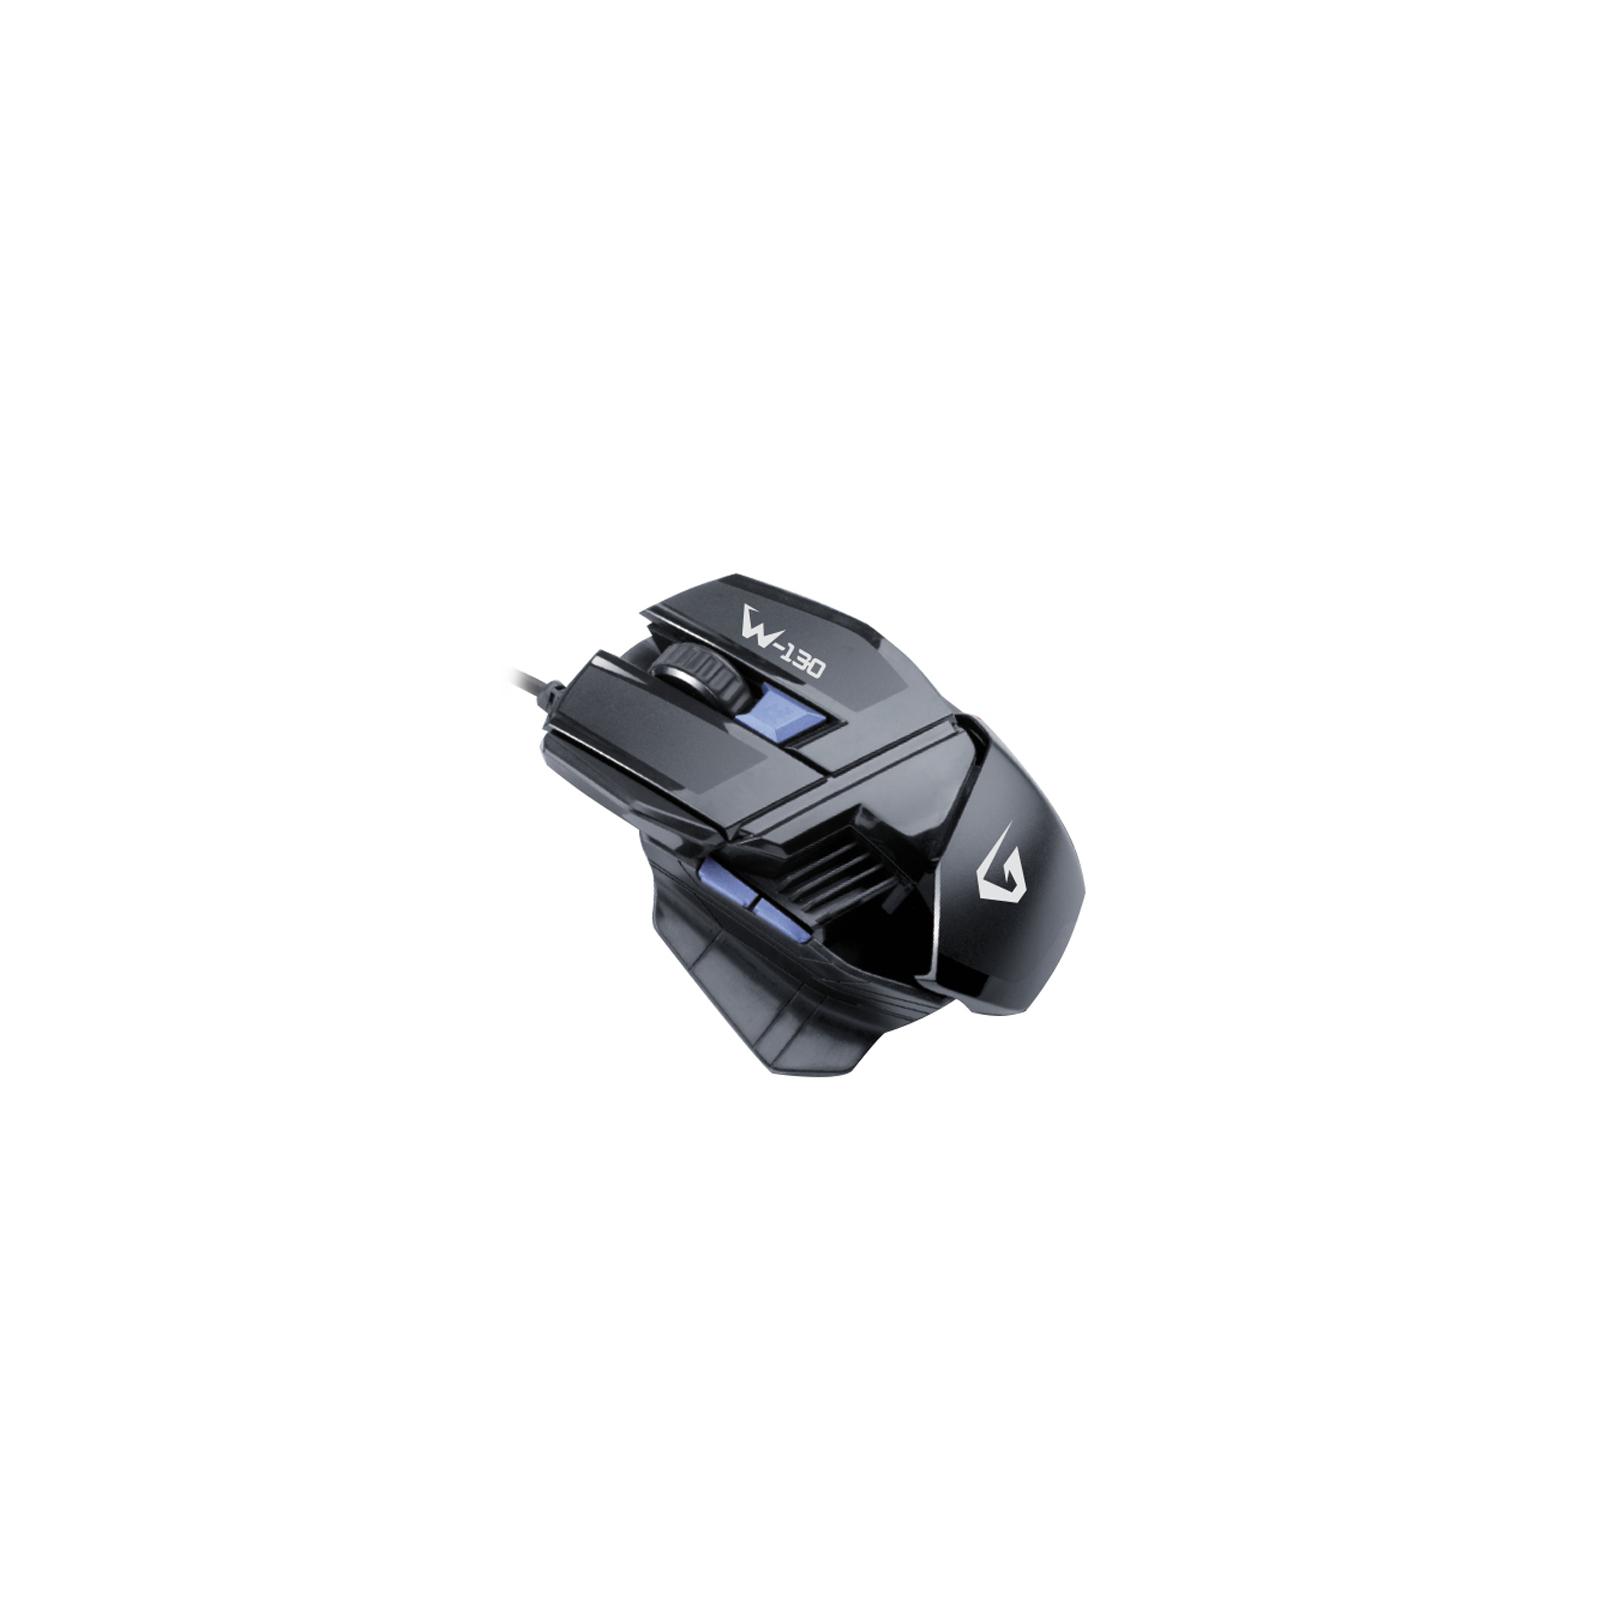 Мышка GEMIX W130